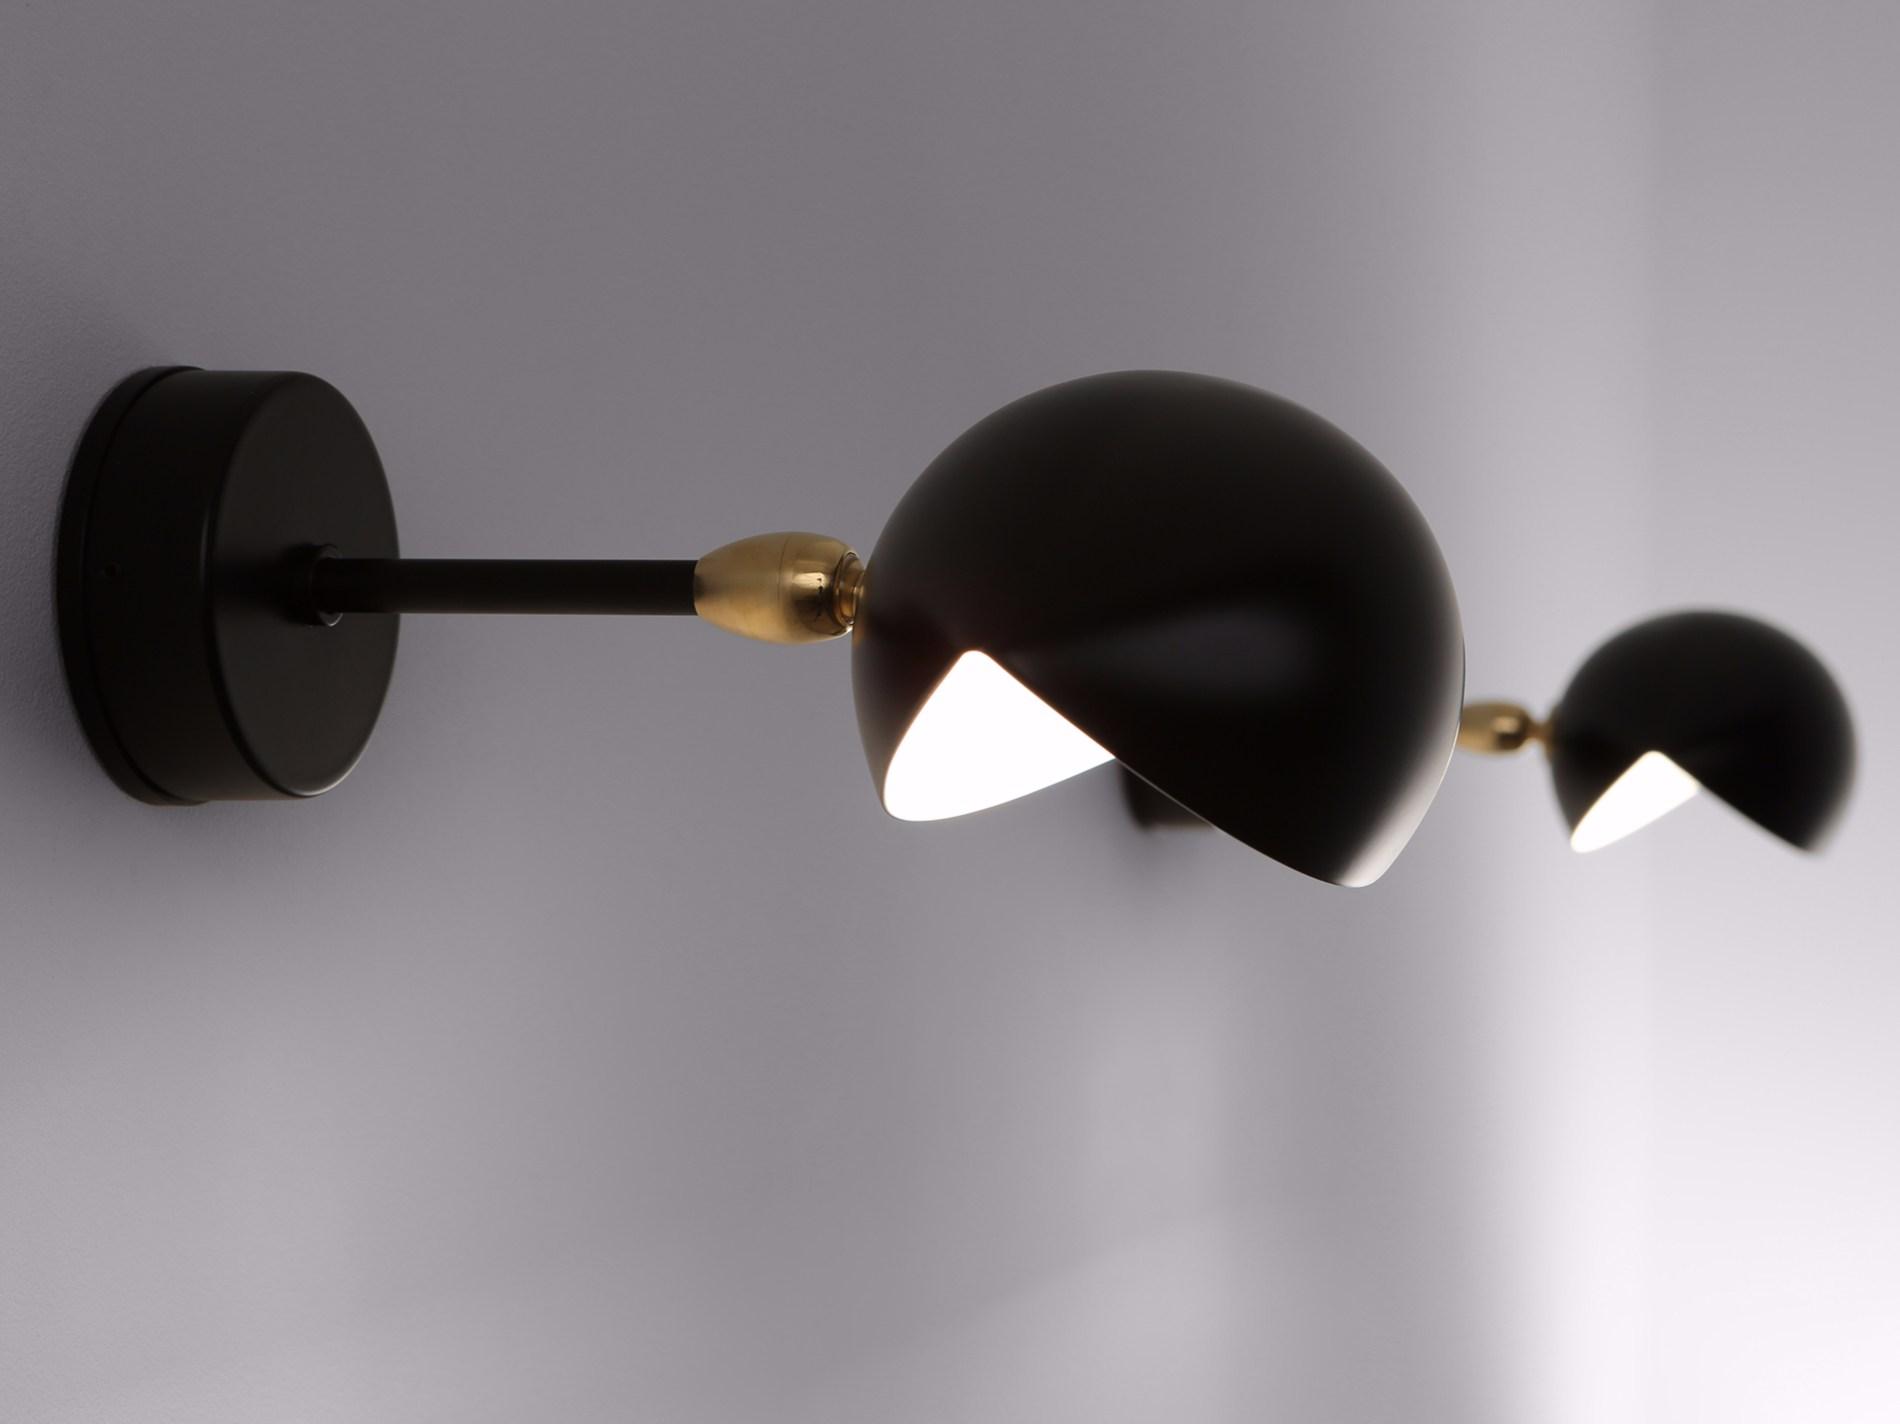 petite applique il. Black Bedroom Furniture Sets. Home Design Ideas